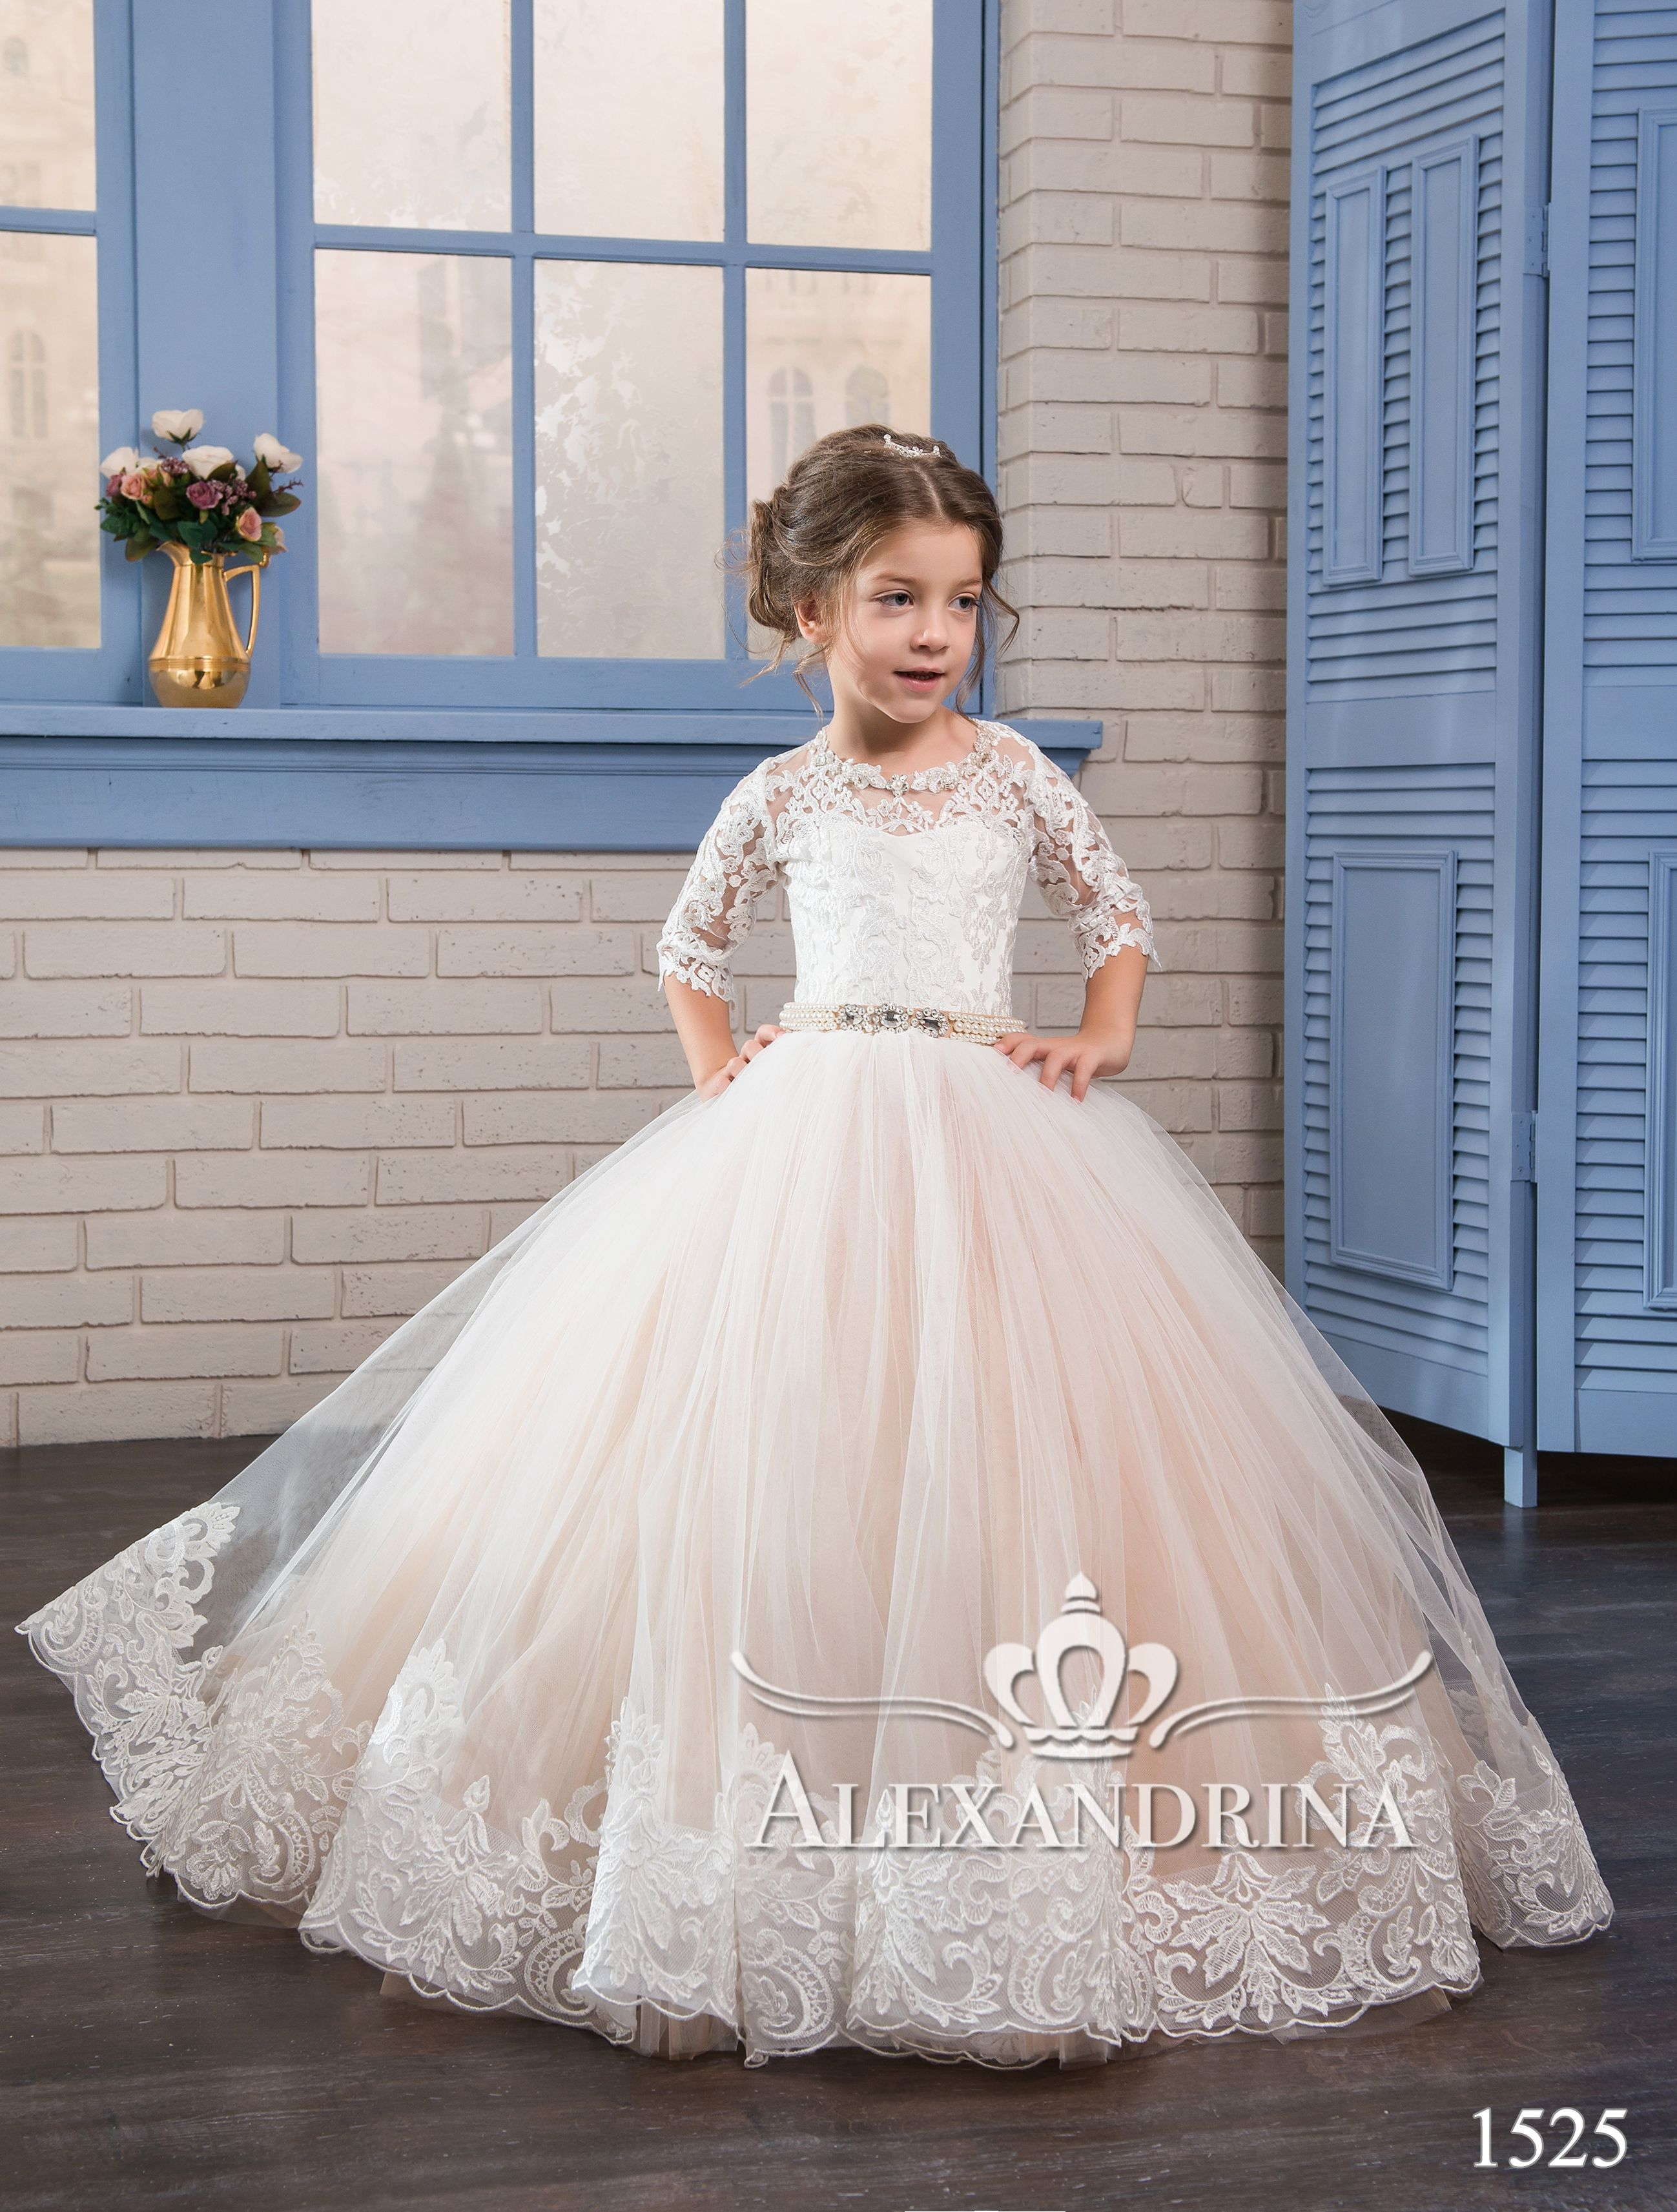 Flower Girls Bow Princess Dress Girls Party Wedding Prom Bridesmaid Gown ZG8